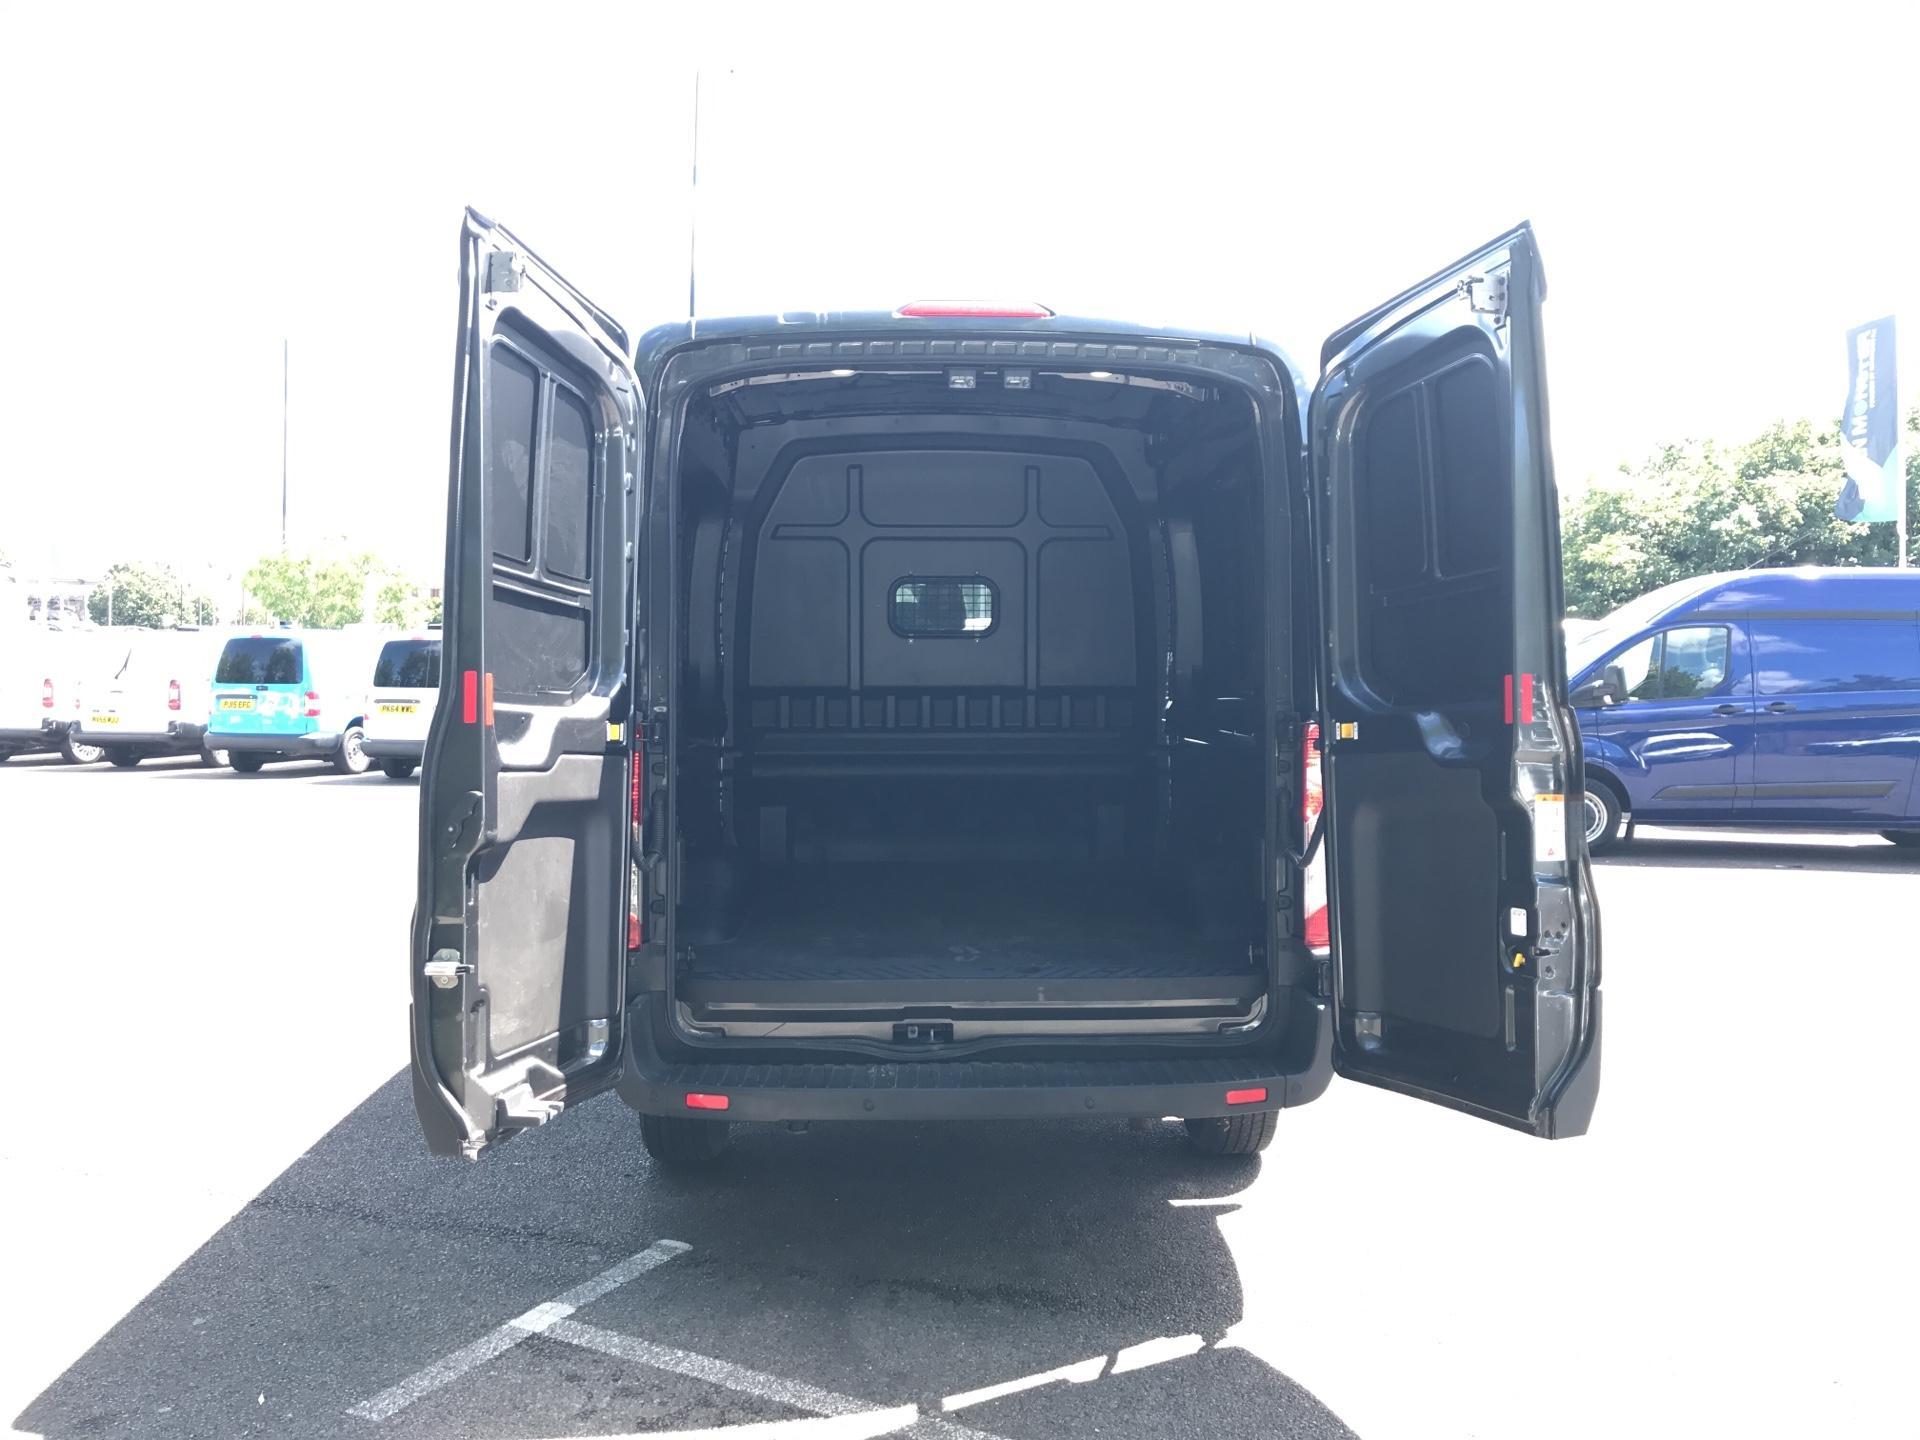 2018 Ford Transit 2.0 Tdci 130Ps H2 D/Cab Crew Van Euro 6 (WU68PXA) Image 25